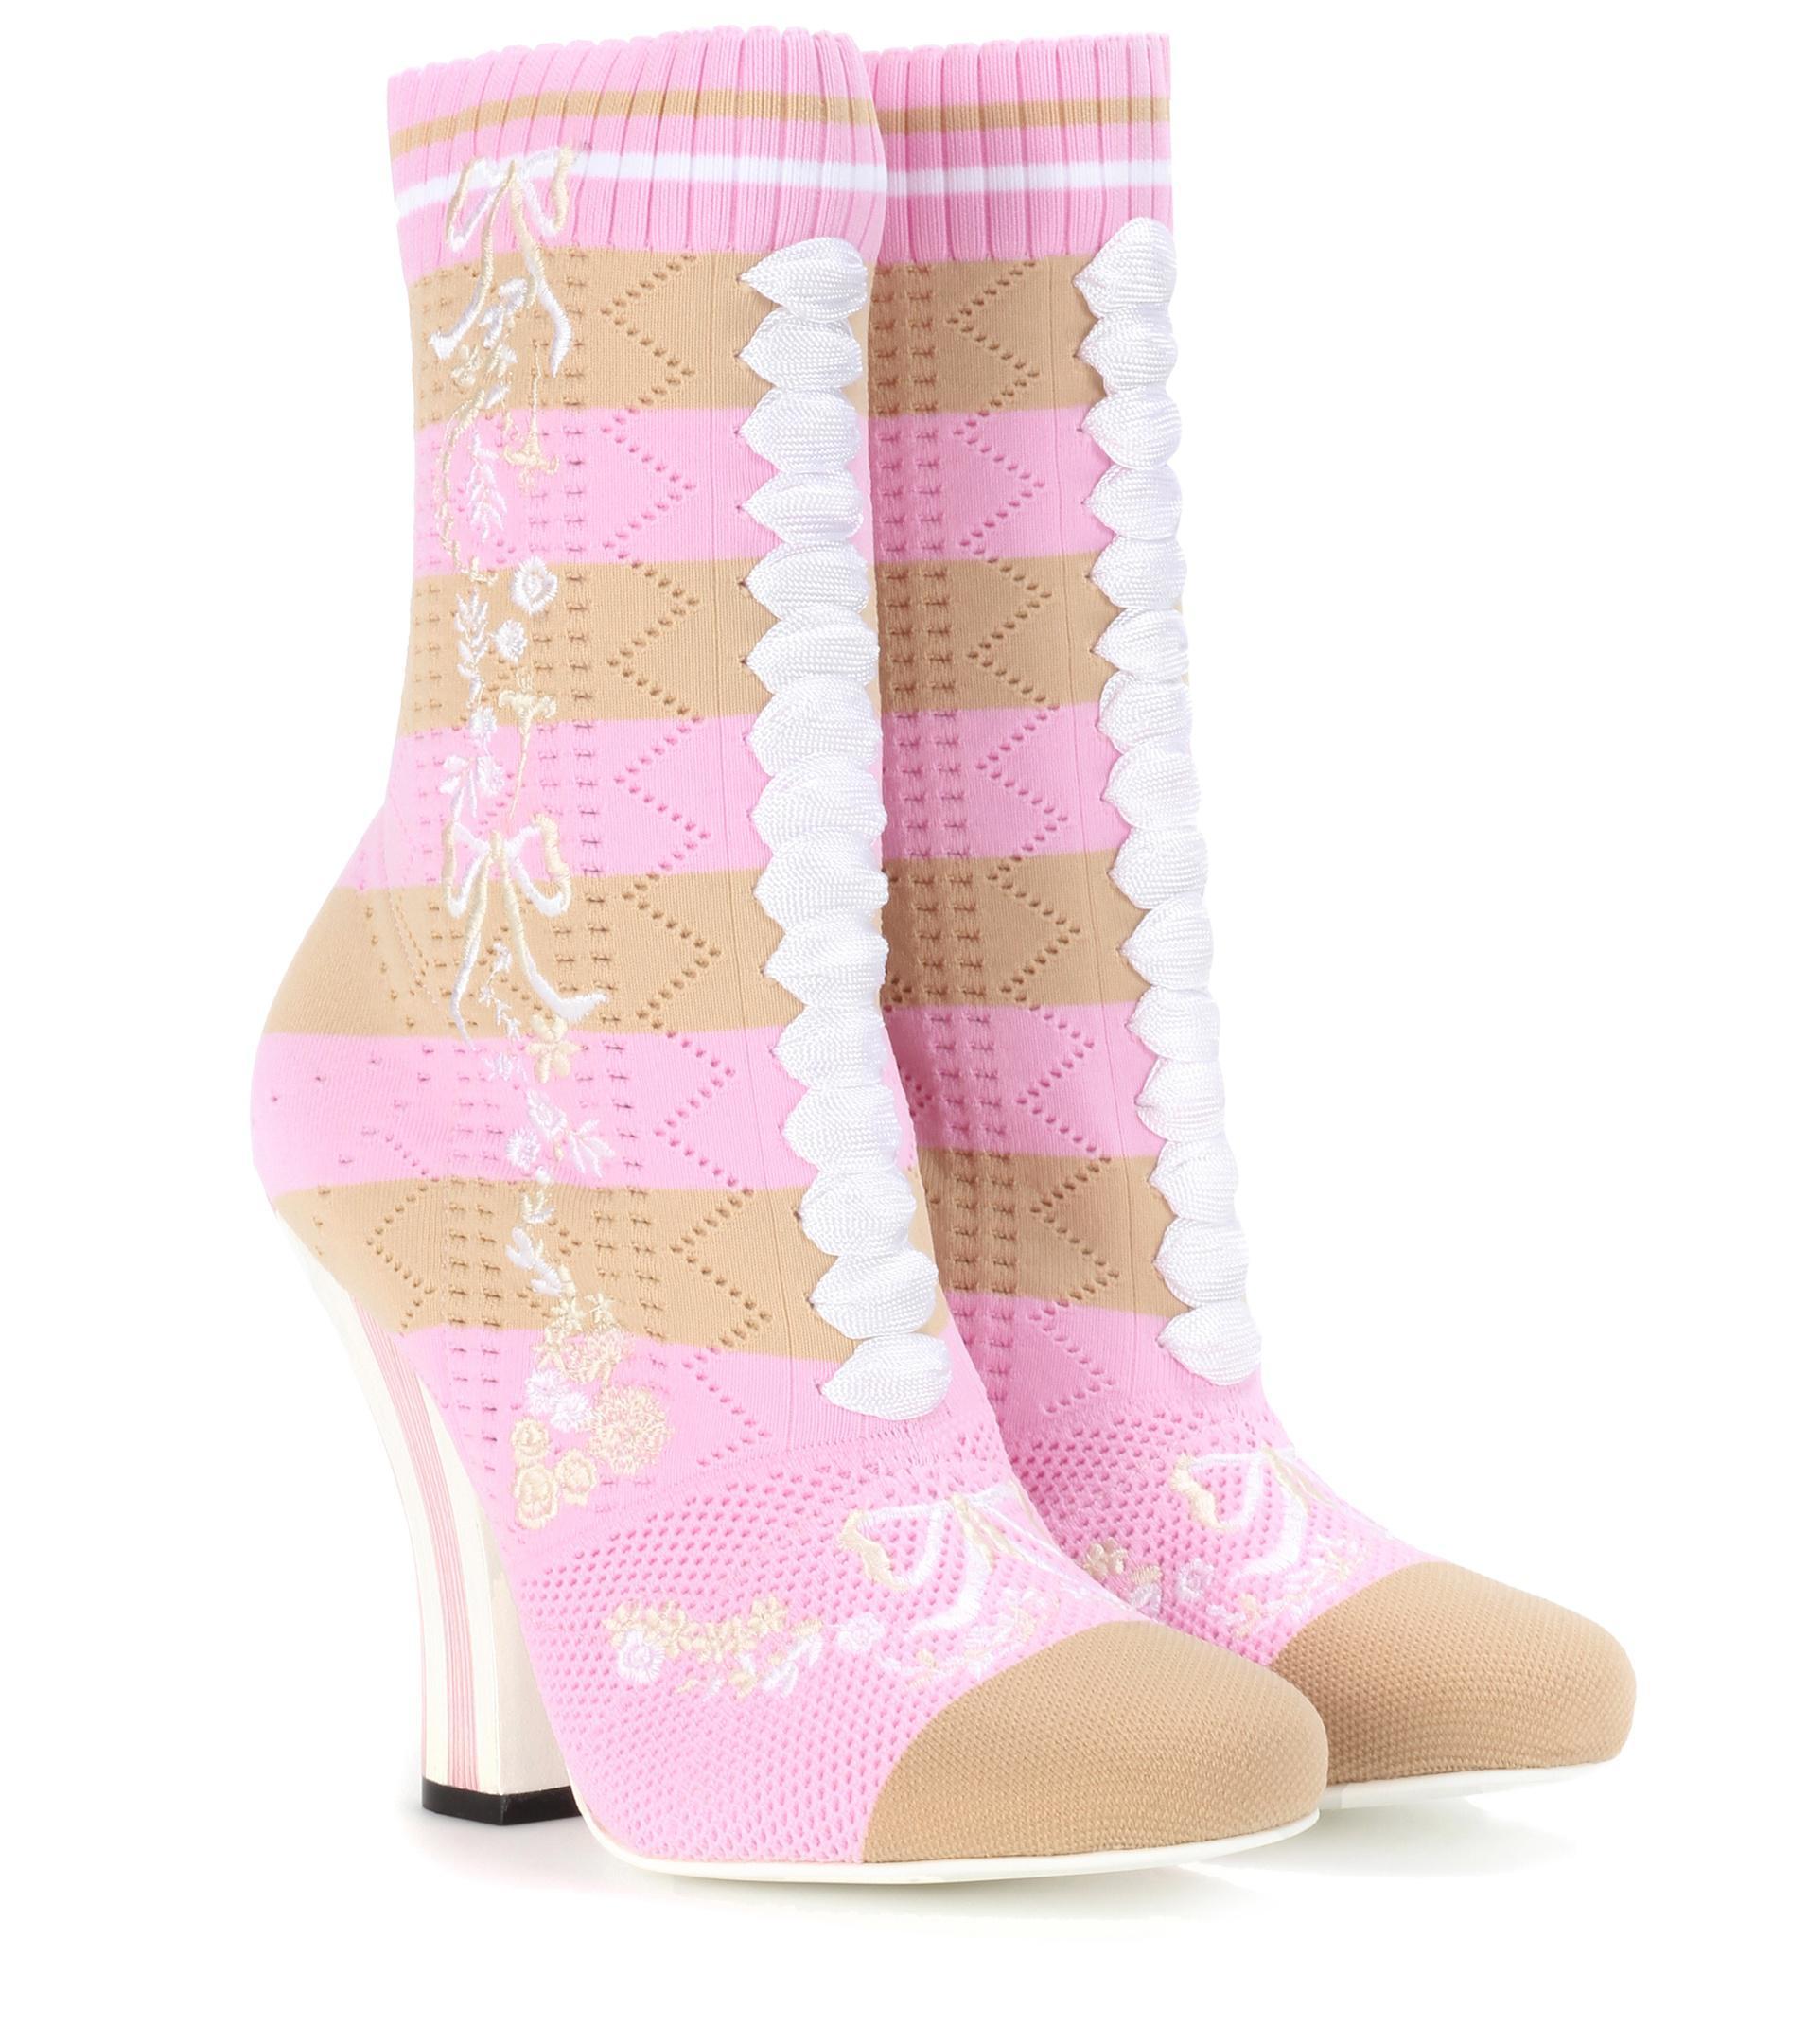 FendiStretch Sock Sandals glvGZGVQiB